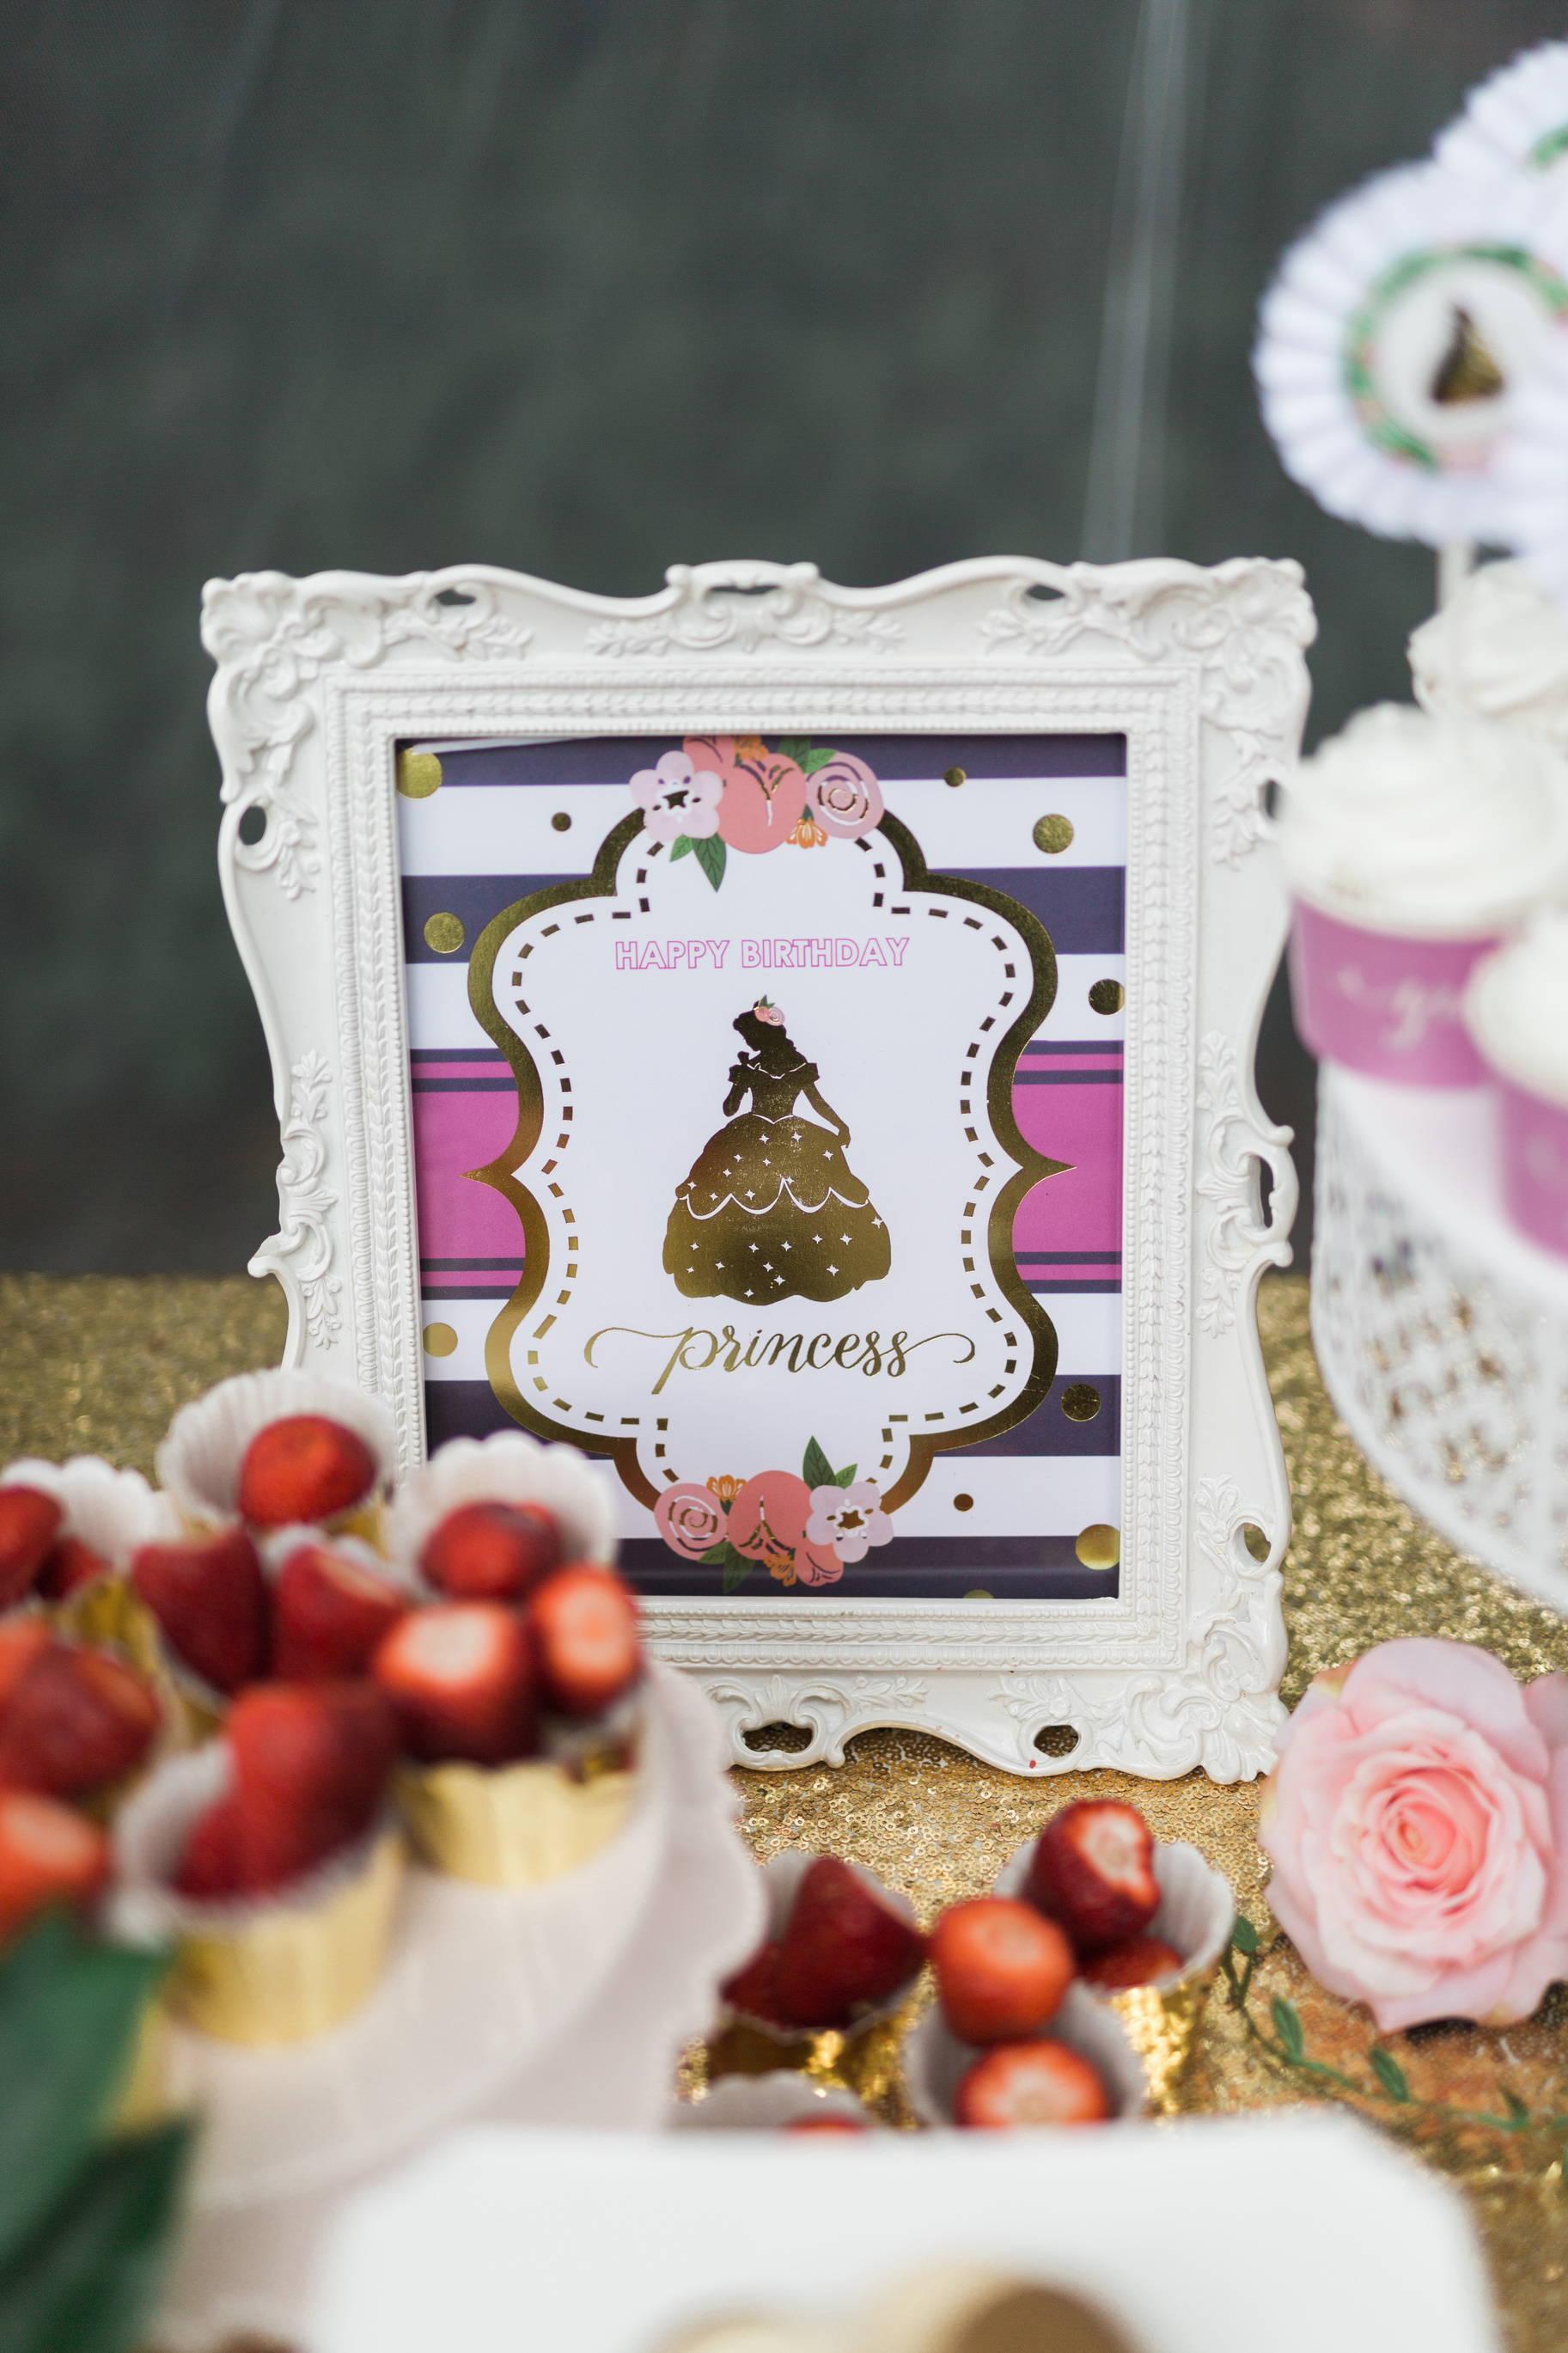 Princess Party Ideas, Princess Party Supplies